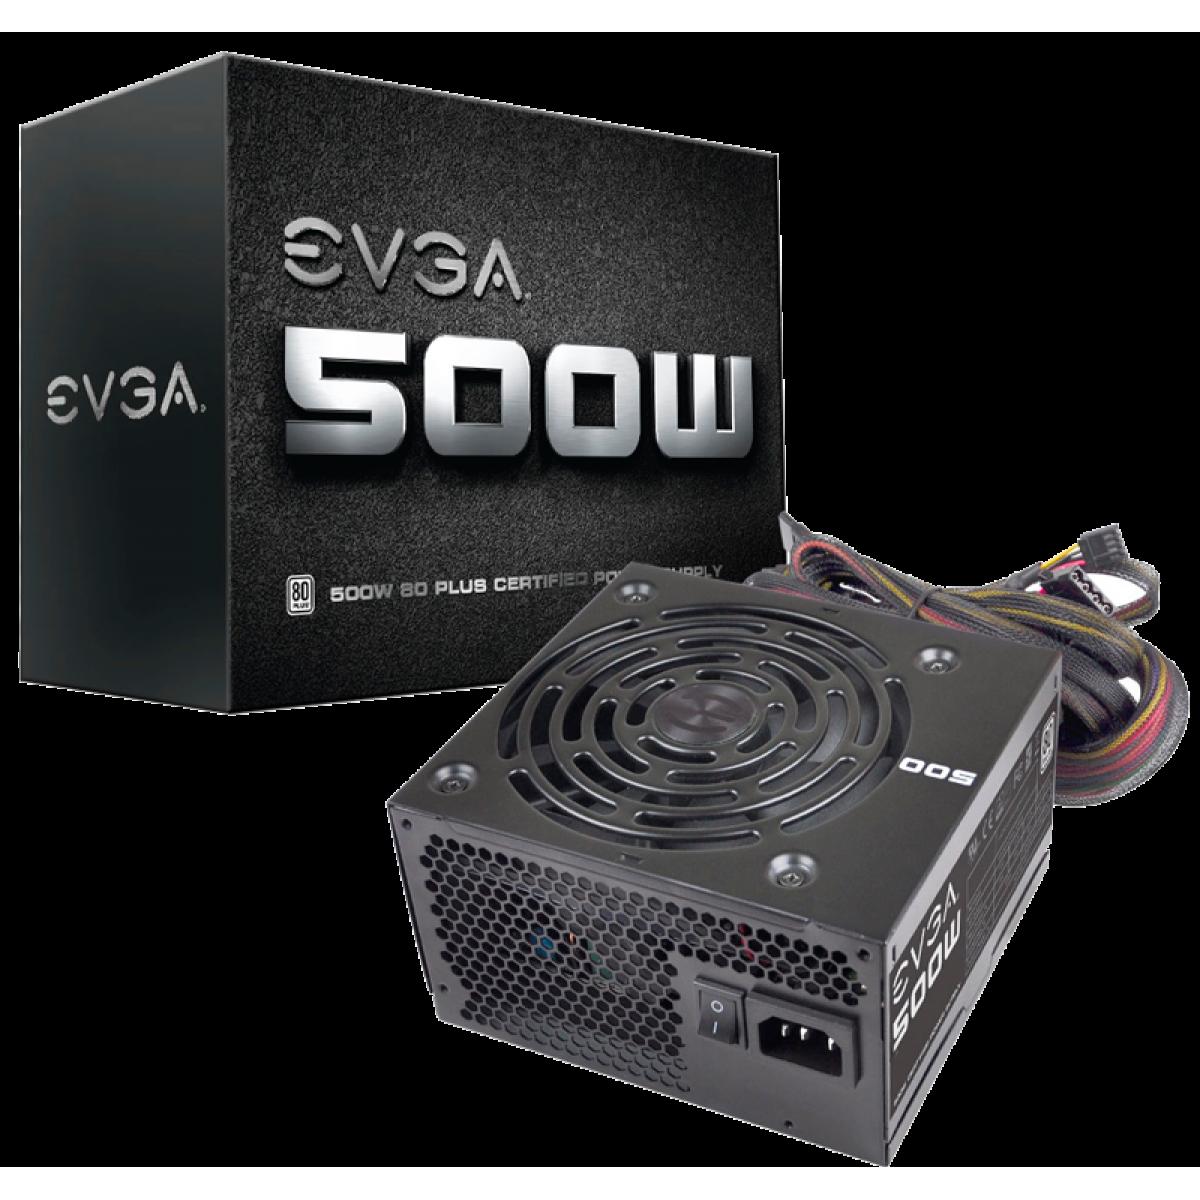 Fonte EVGA 500 W1 500W, 80 plus White, PFC Ativo, 100-W1-0500-KR